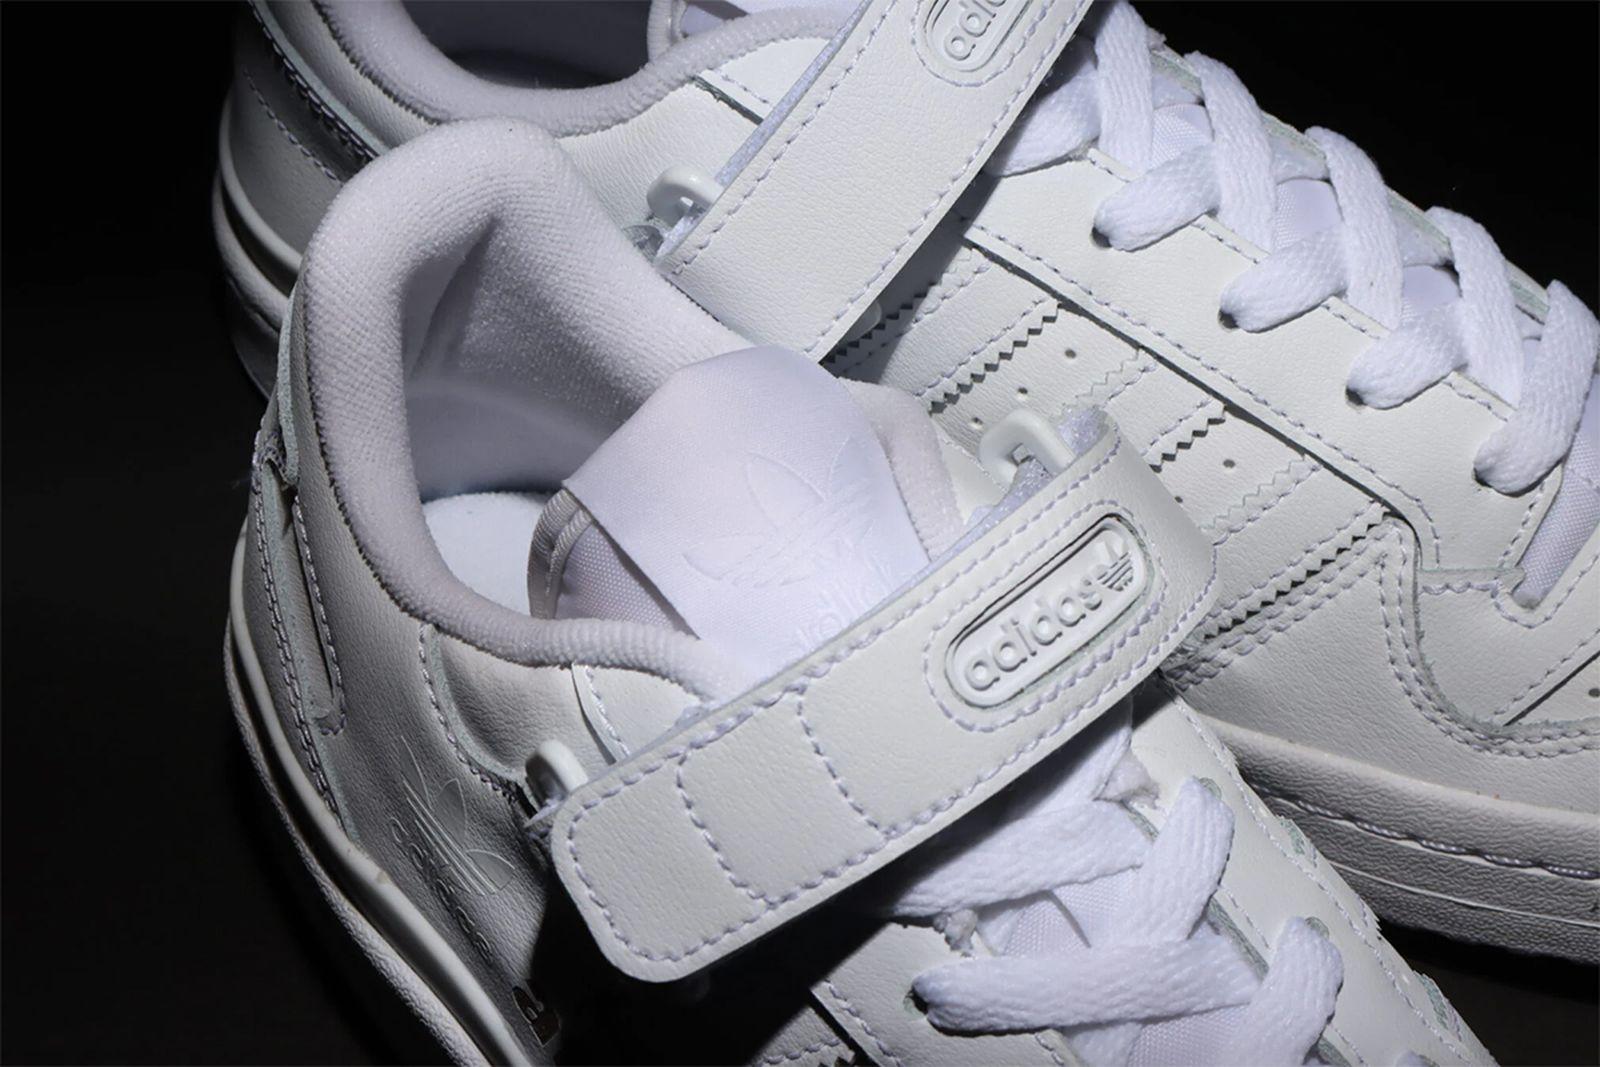 atmos-adidas-forum-low-release-info-05